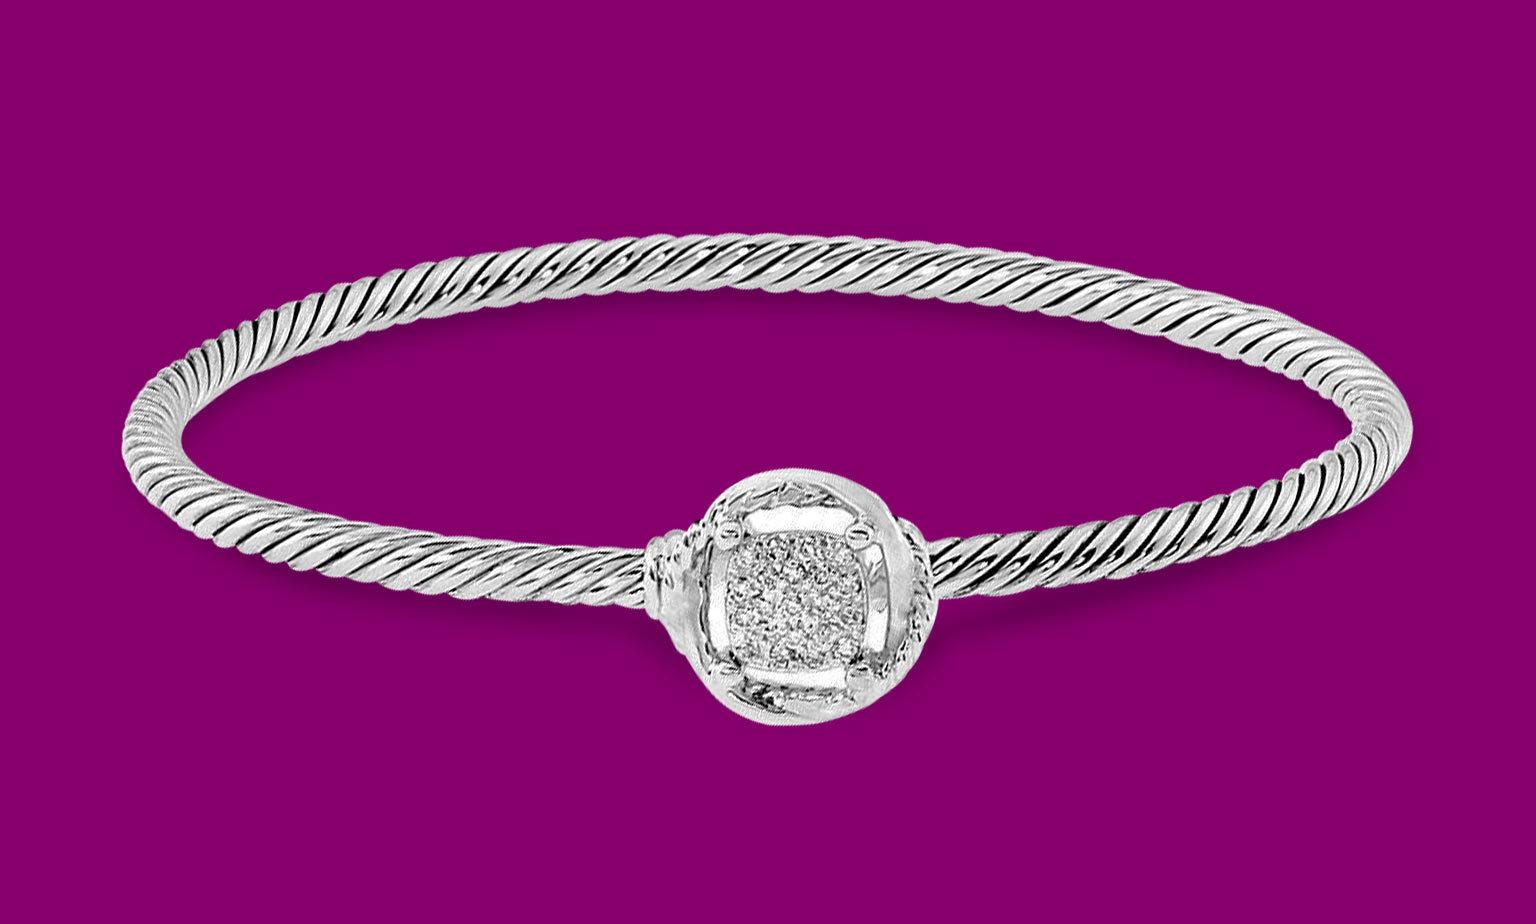 David Yurman Jewelry Up to 45% Off